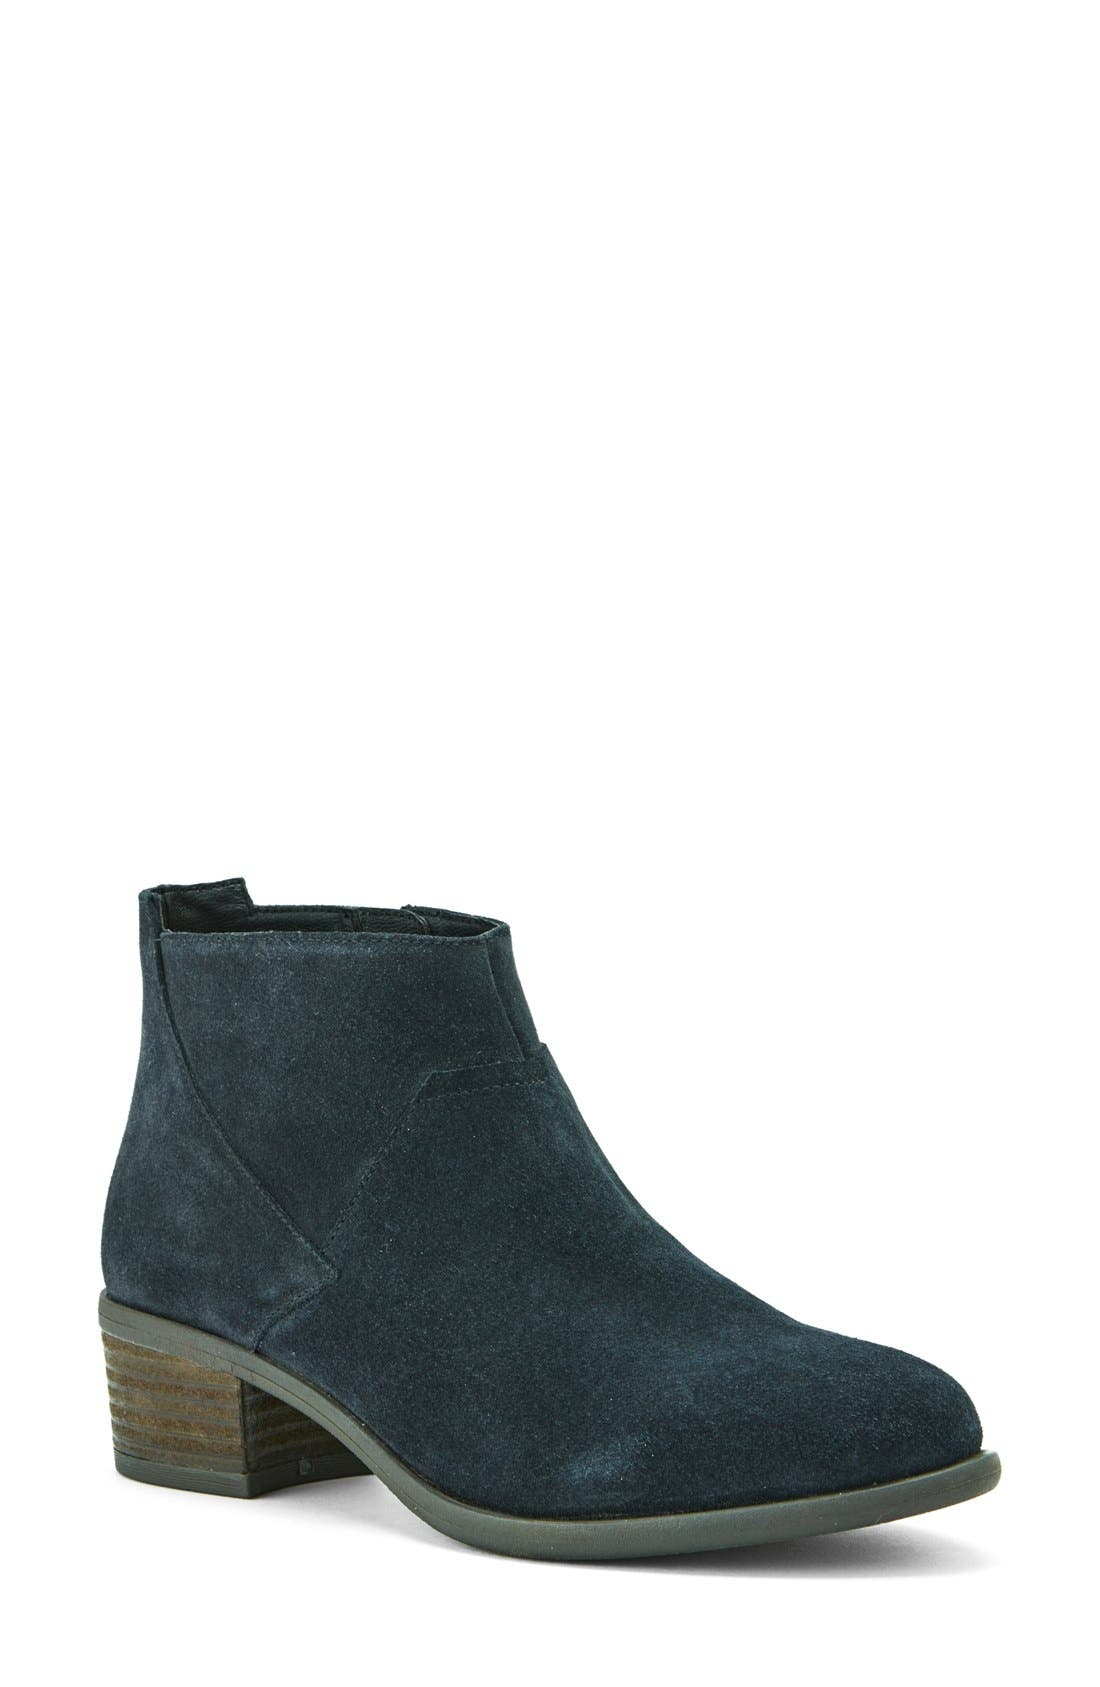 Main Image - Blondo 'Maddie' Waterproof Ankle Boot (Women)